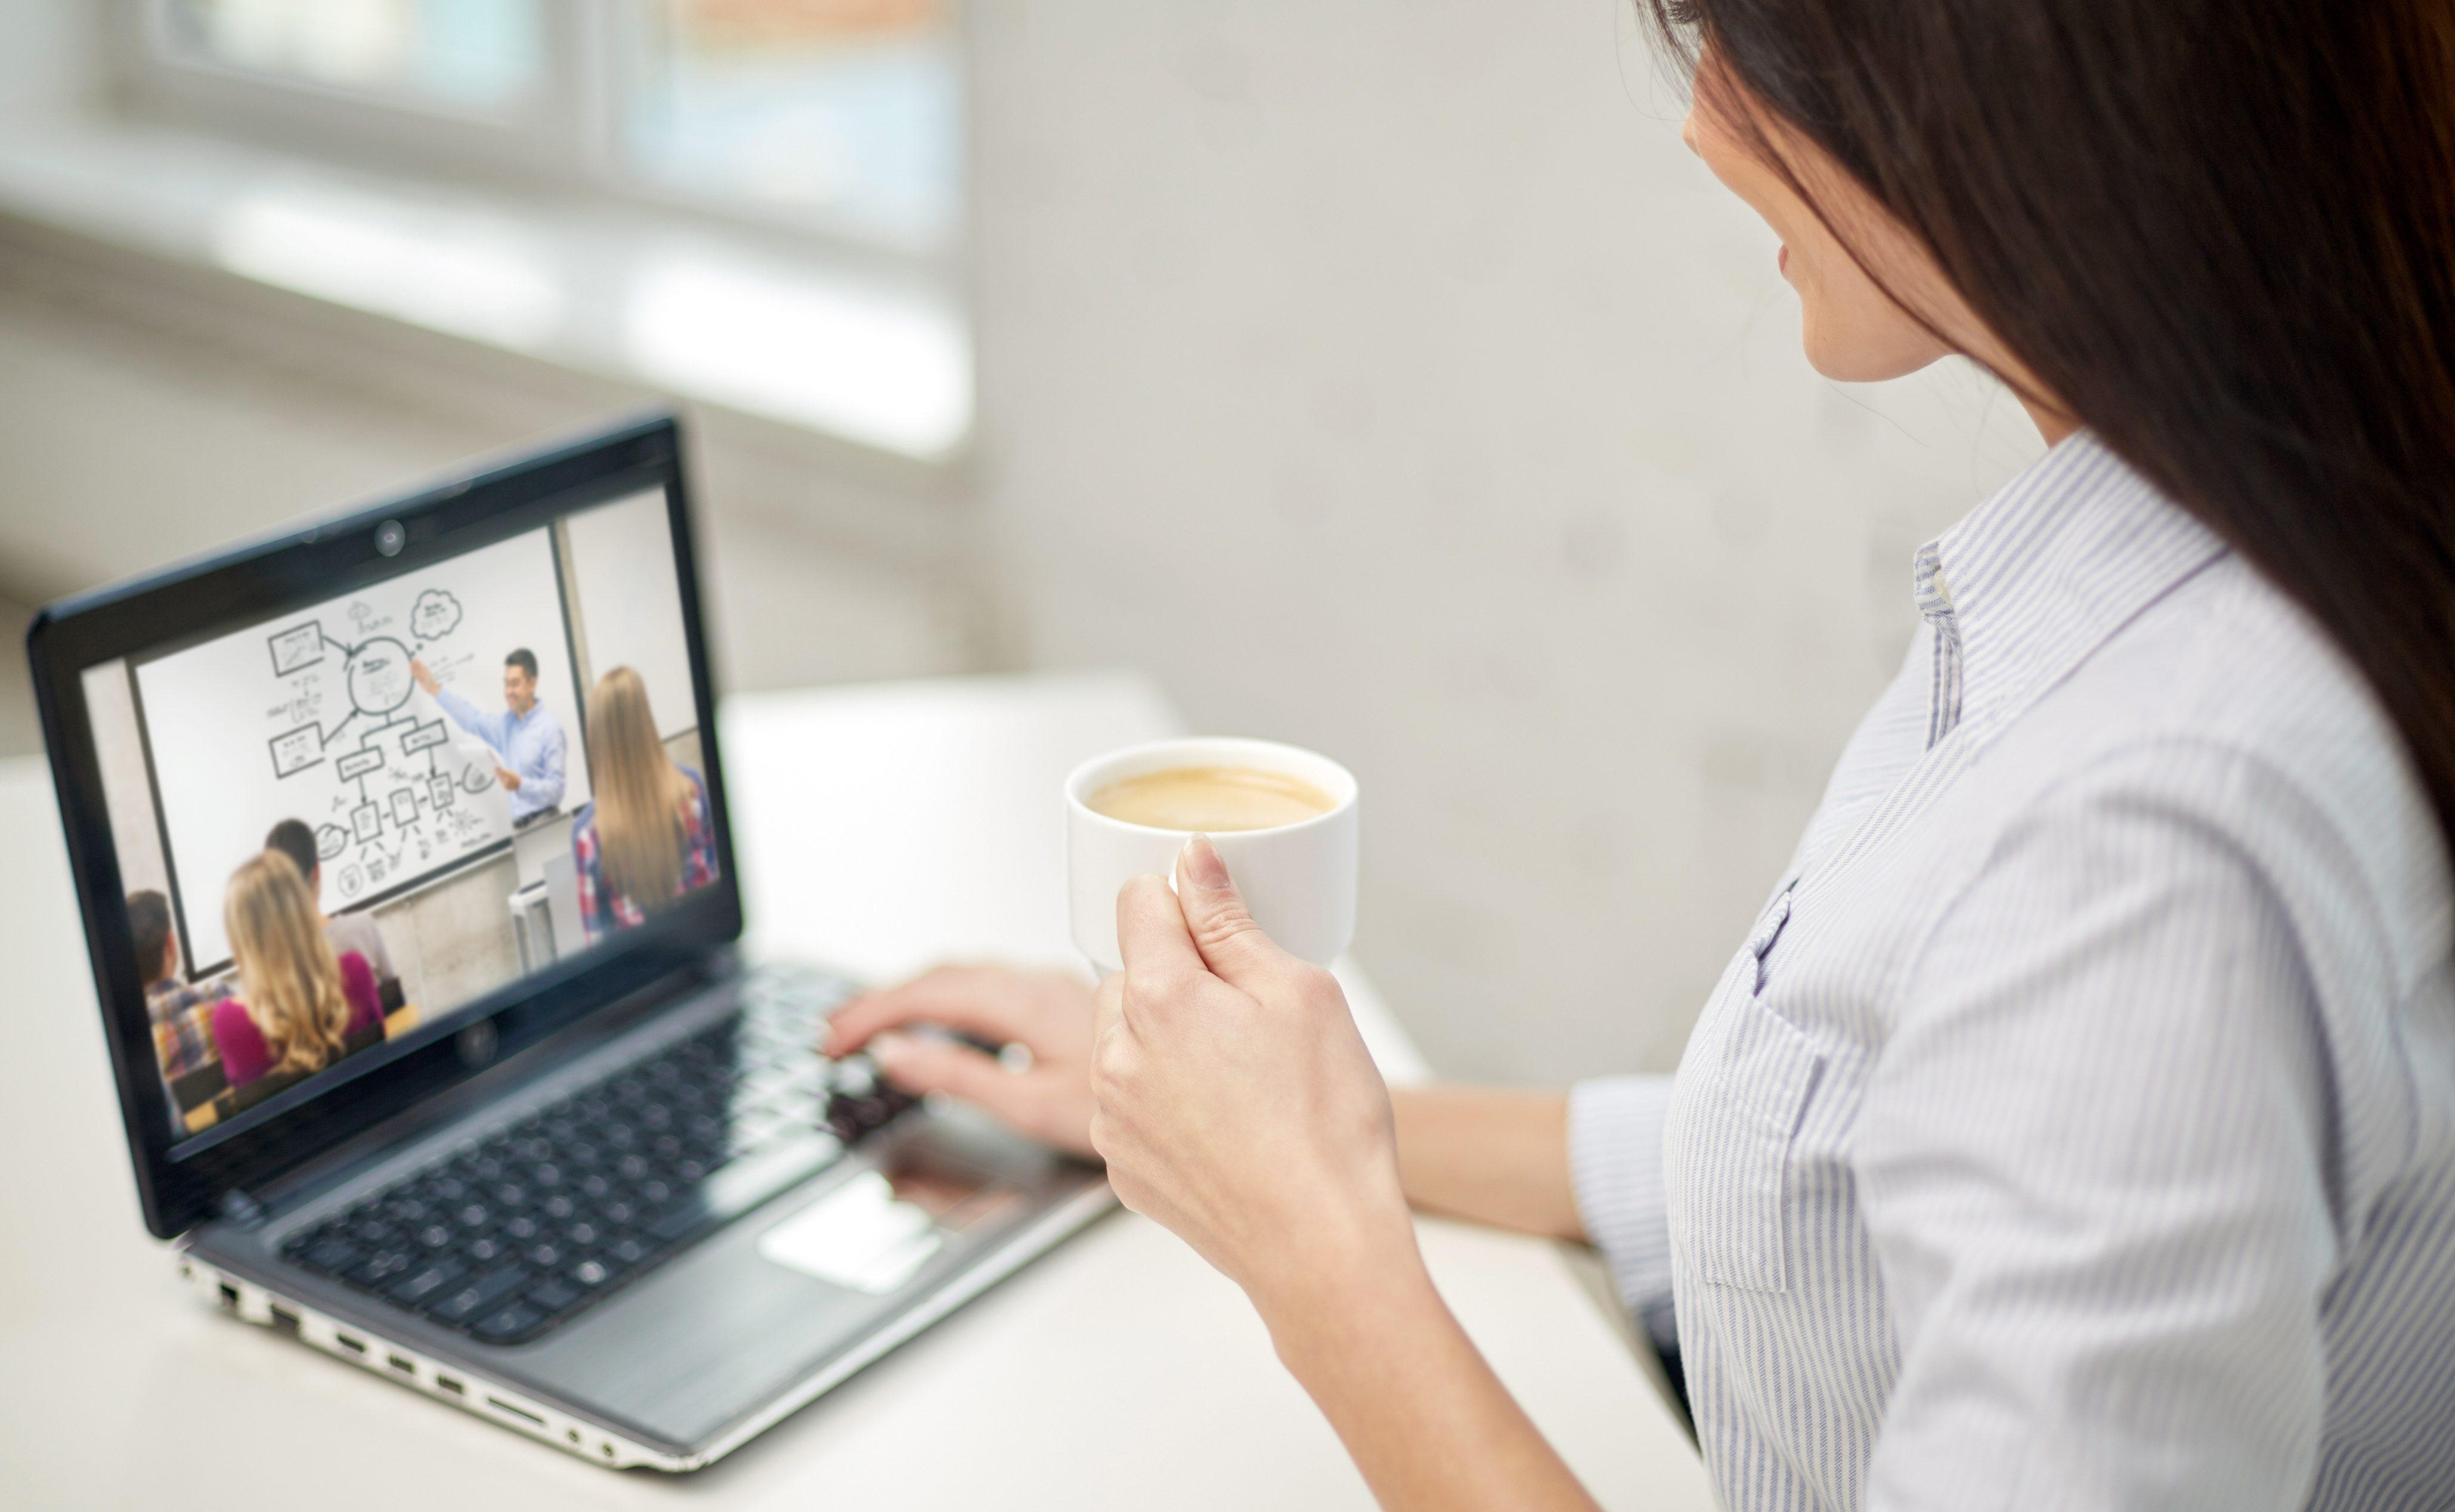 Weiterbildung trotz Corona-Pandemie *** Online-Training statt Präsenztraining bei eo ipso